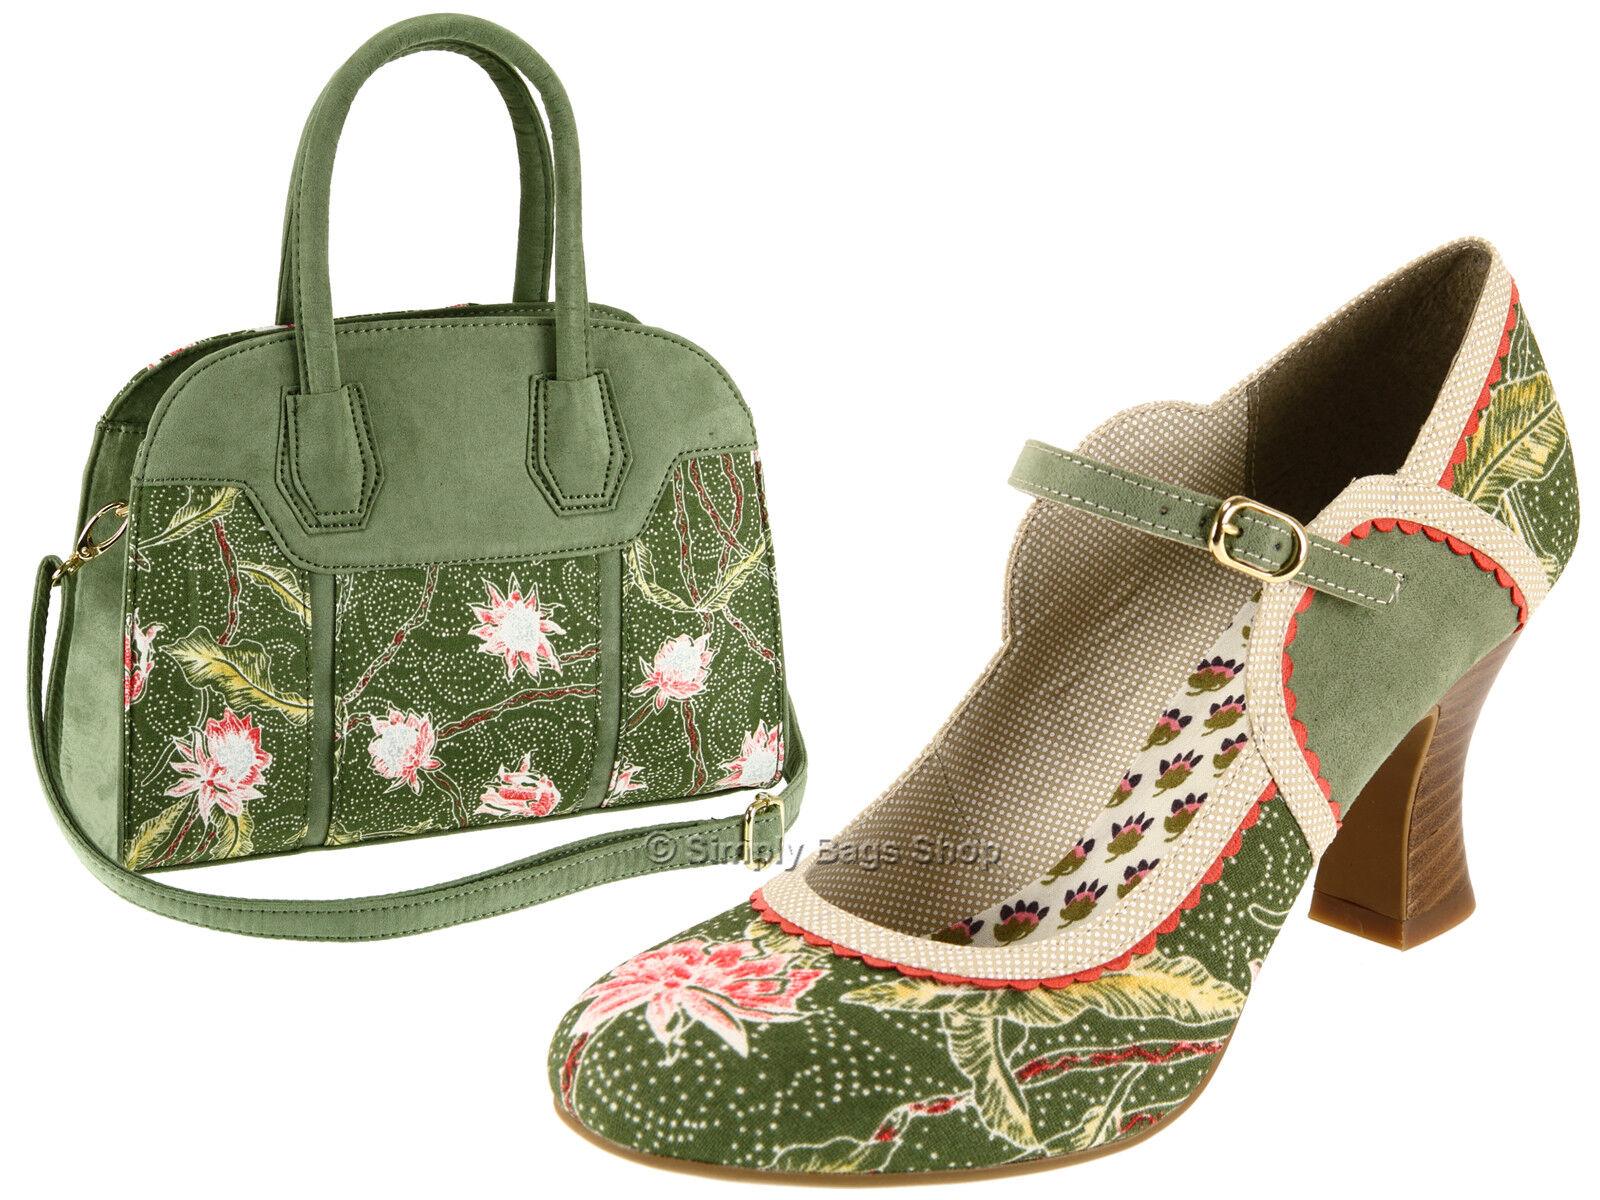 Ruby Shoo Rosalind Donna Louis tacco scarpe Mary Janes-Aggiungi borsa abbinata Cancun